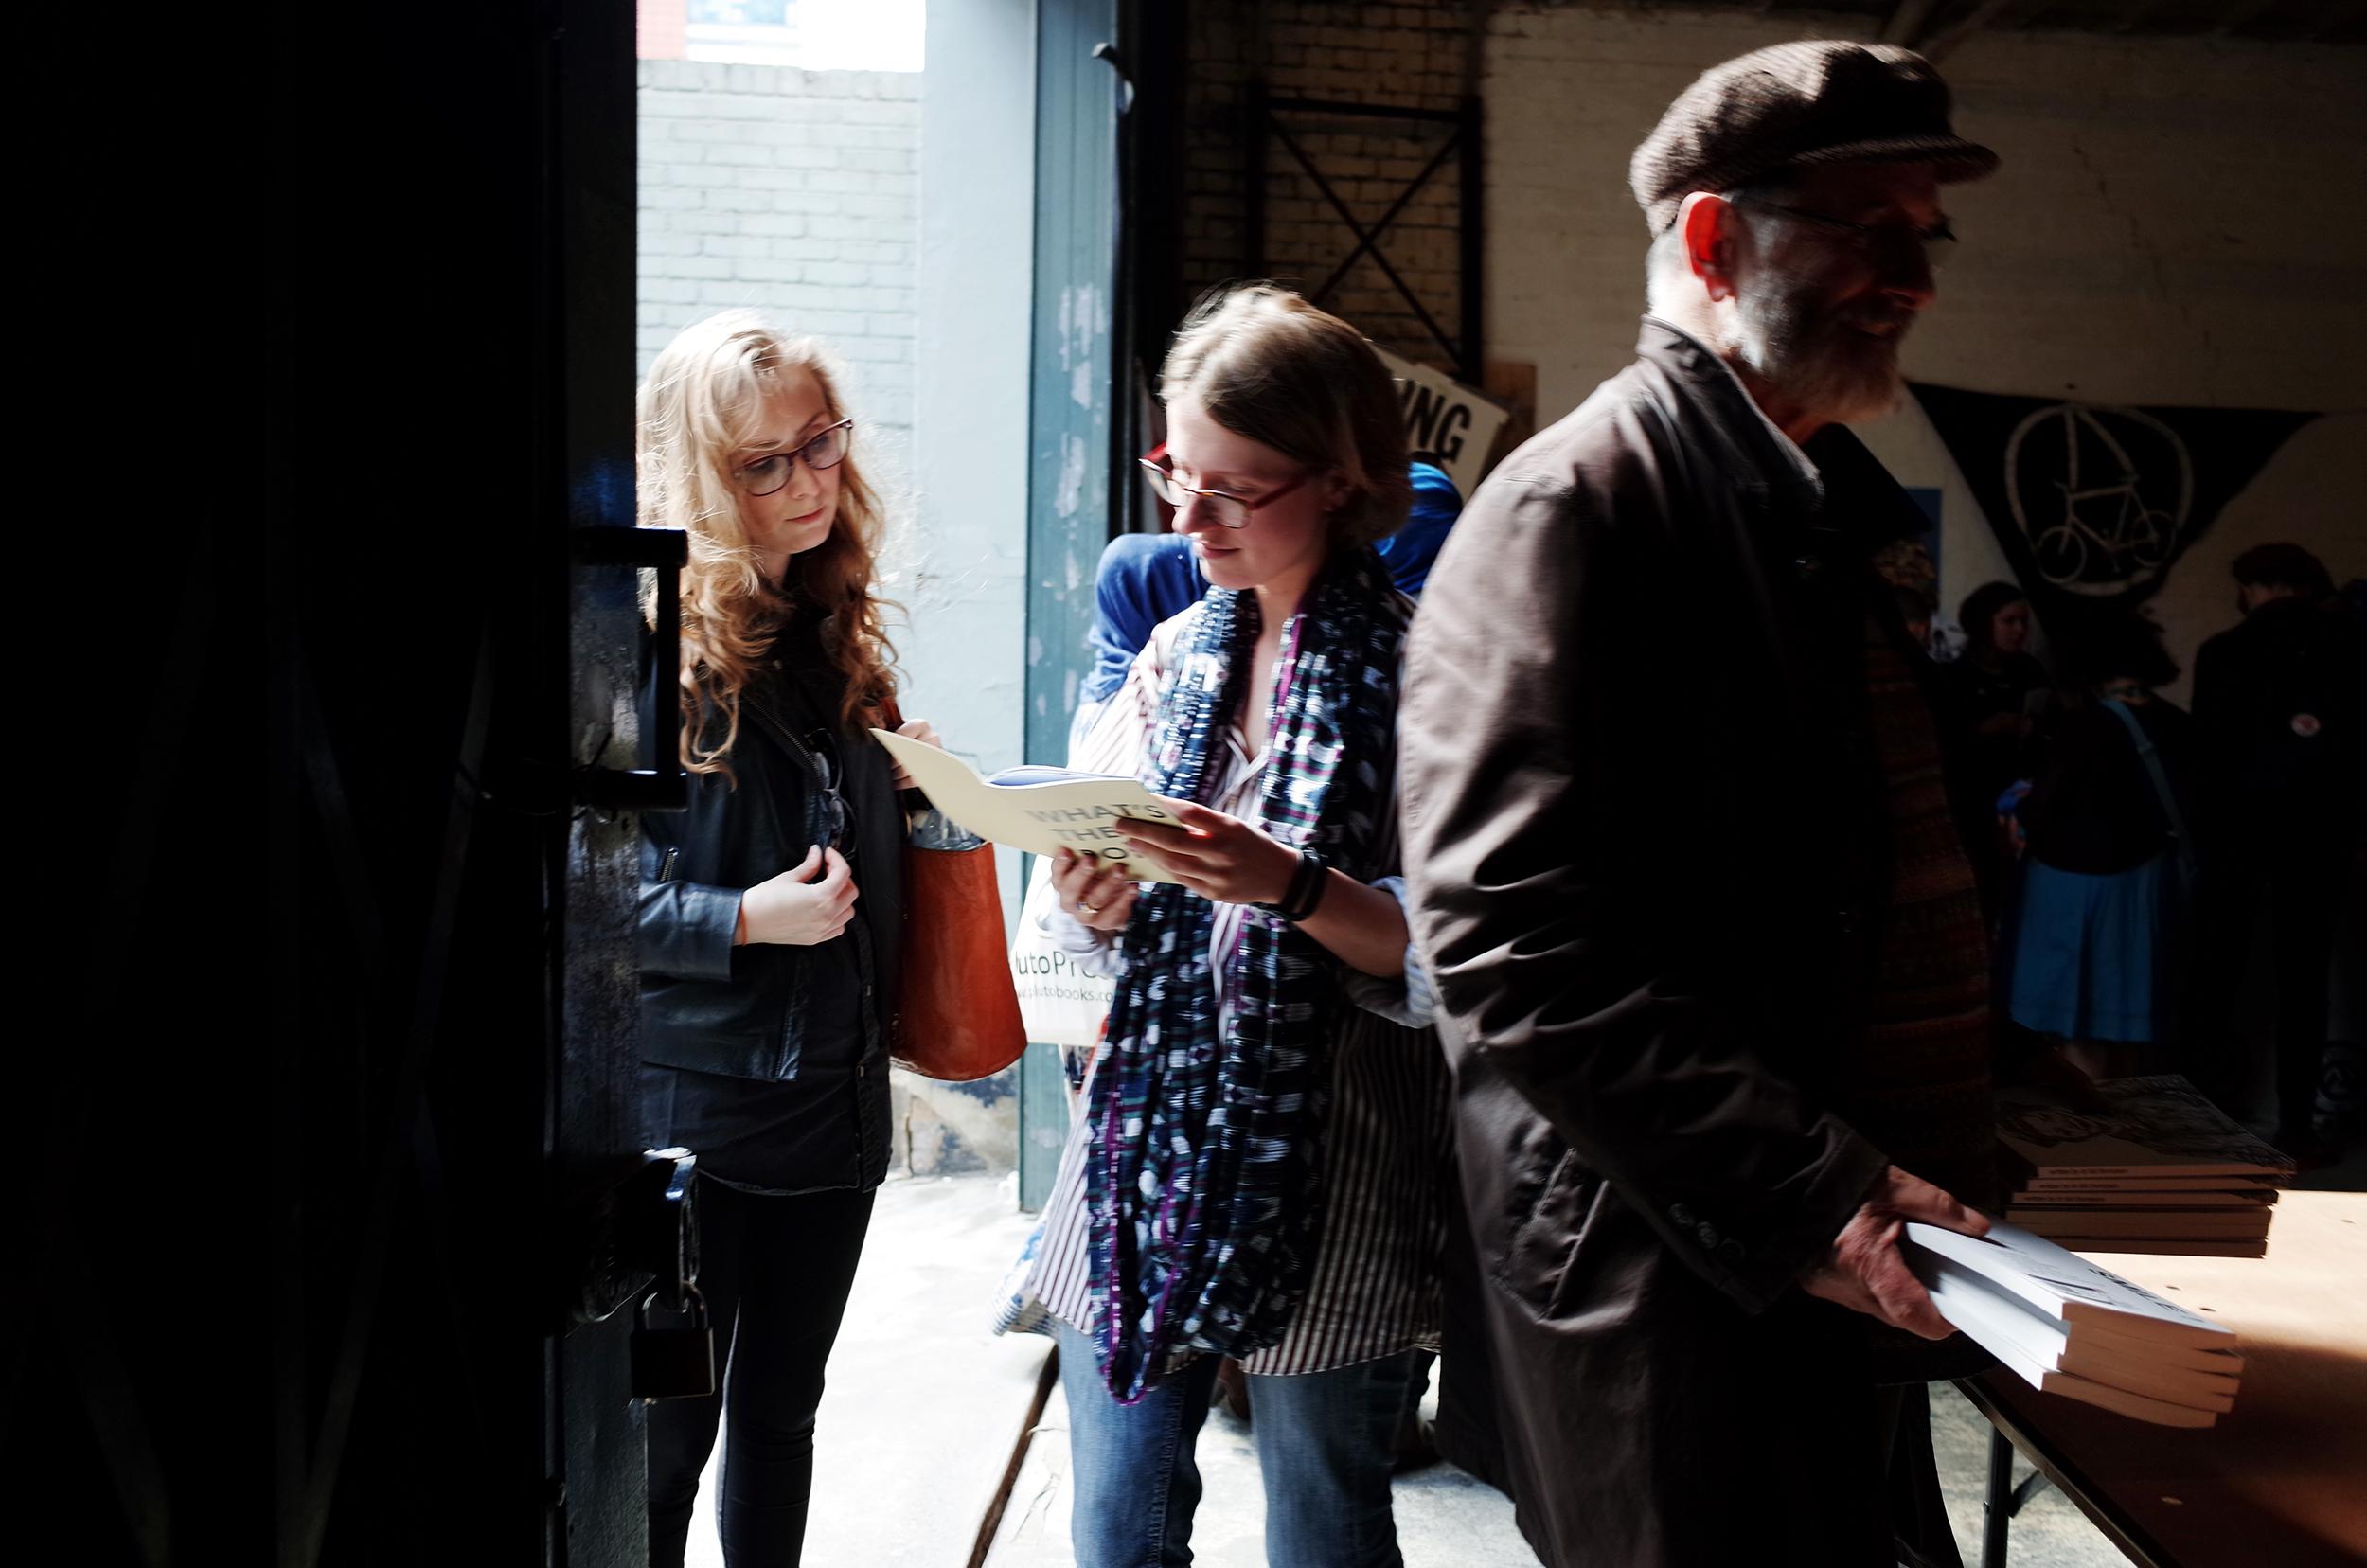 Takeover radical book fair, London, 2015